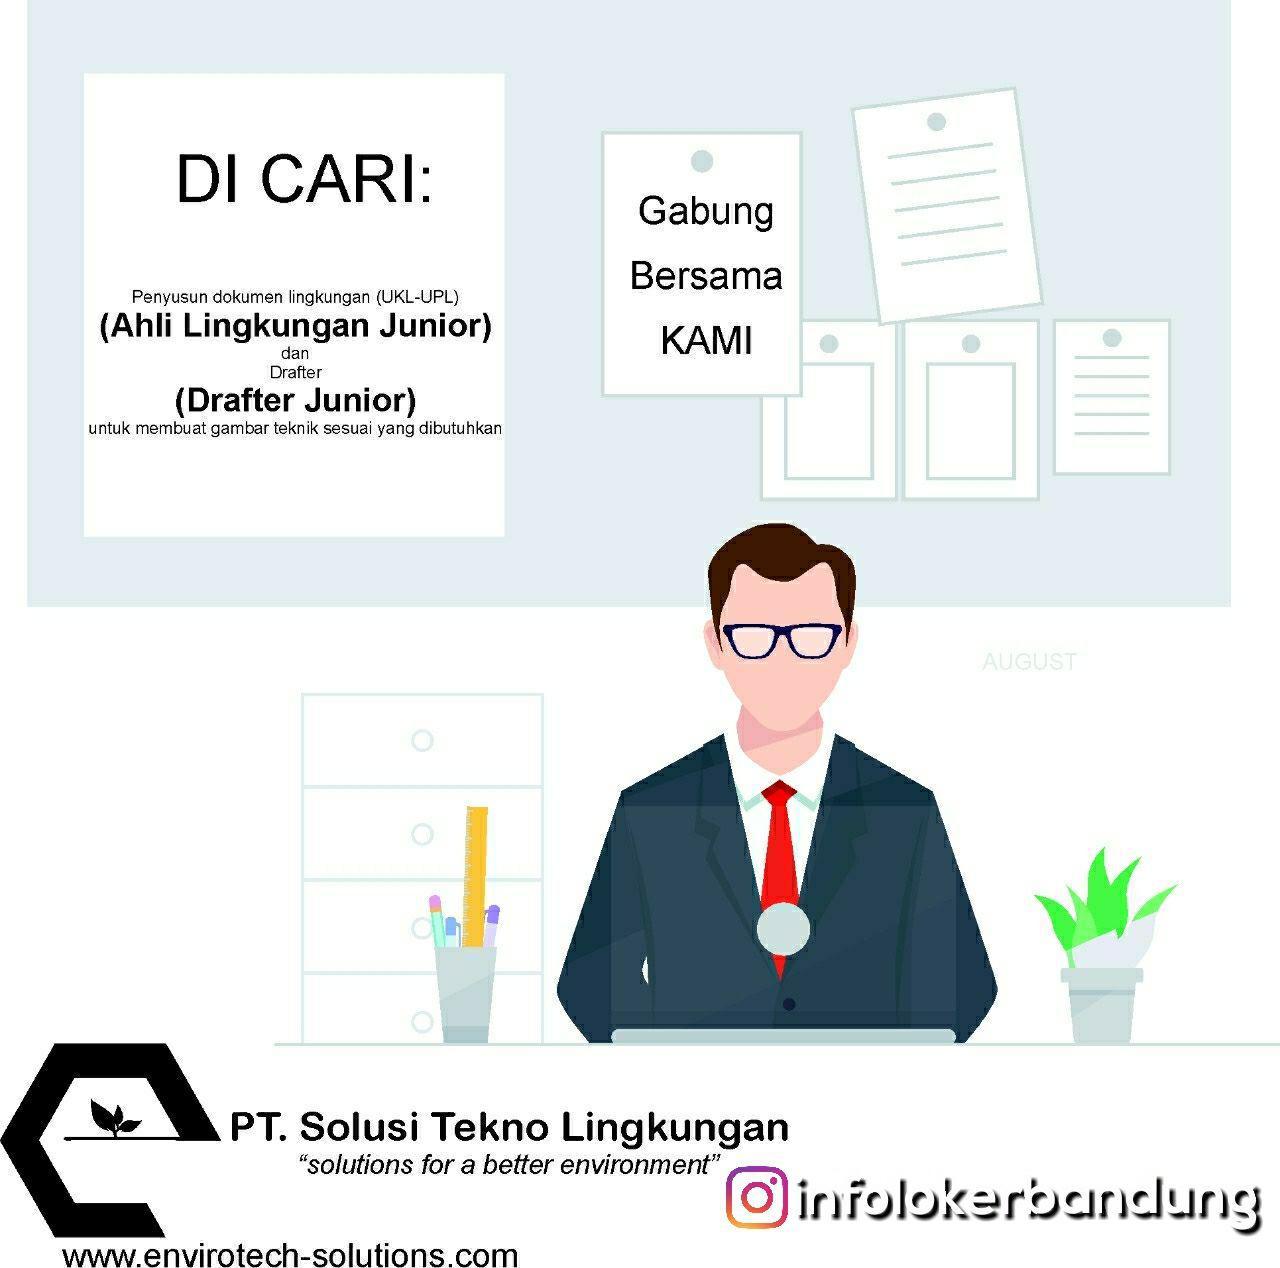 Lowongan Kerja PT. Solusi Tekno Lingkungan Bandung September 2018